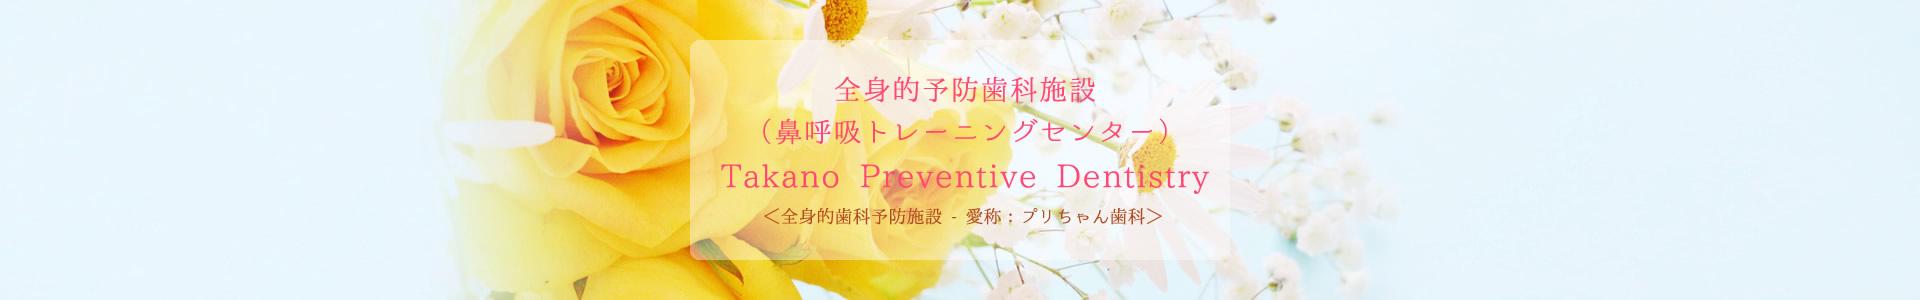 全身的予防歯科施設 Takano Preventive Dentistry